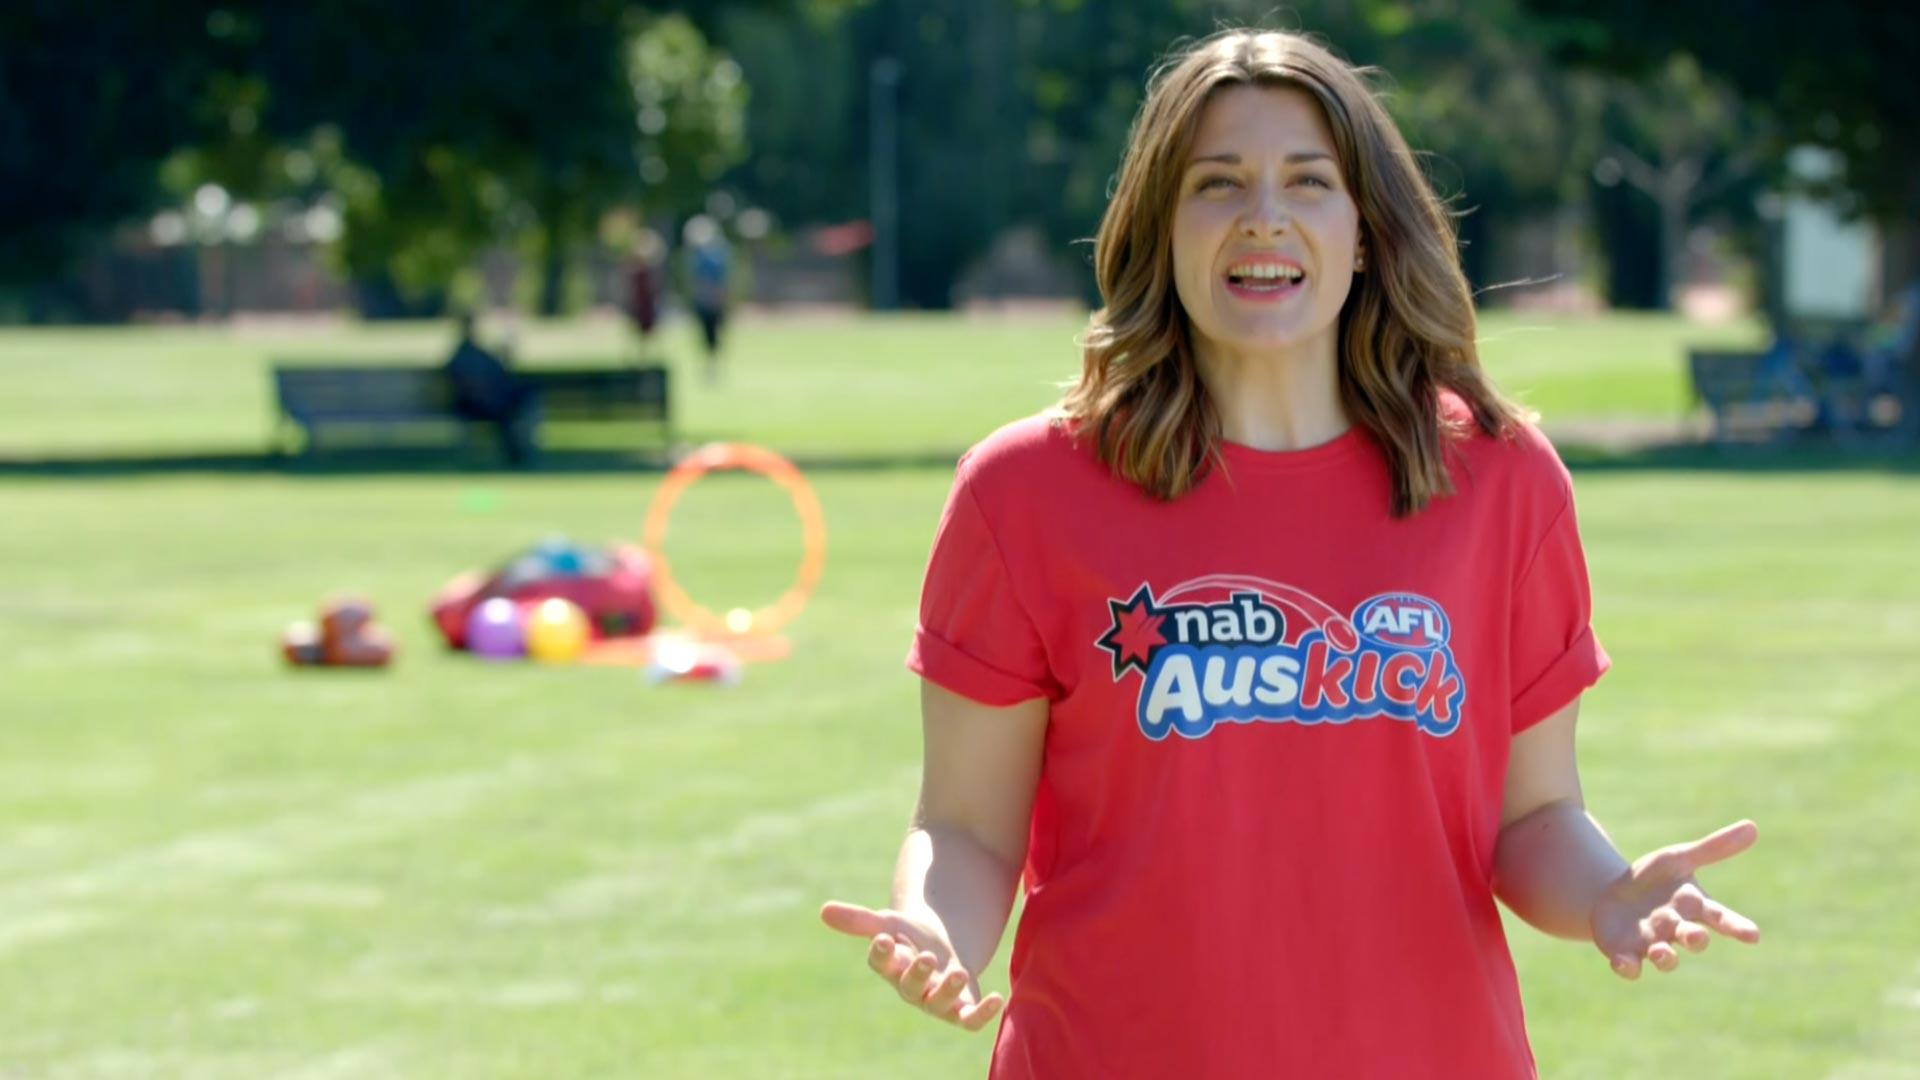 NAB AFL AUSKICK | Play AFL